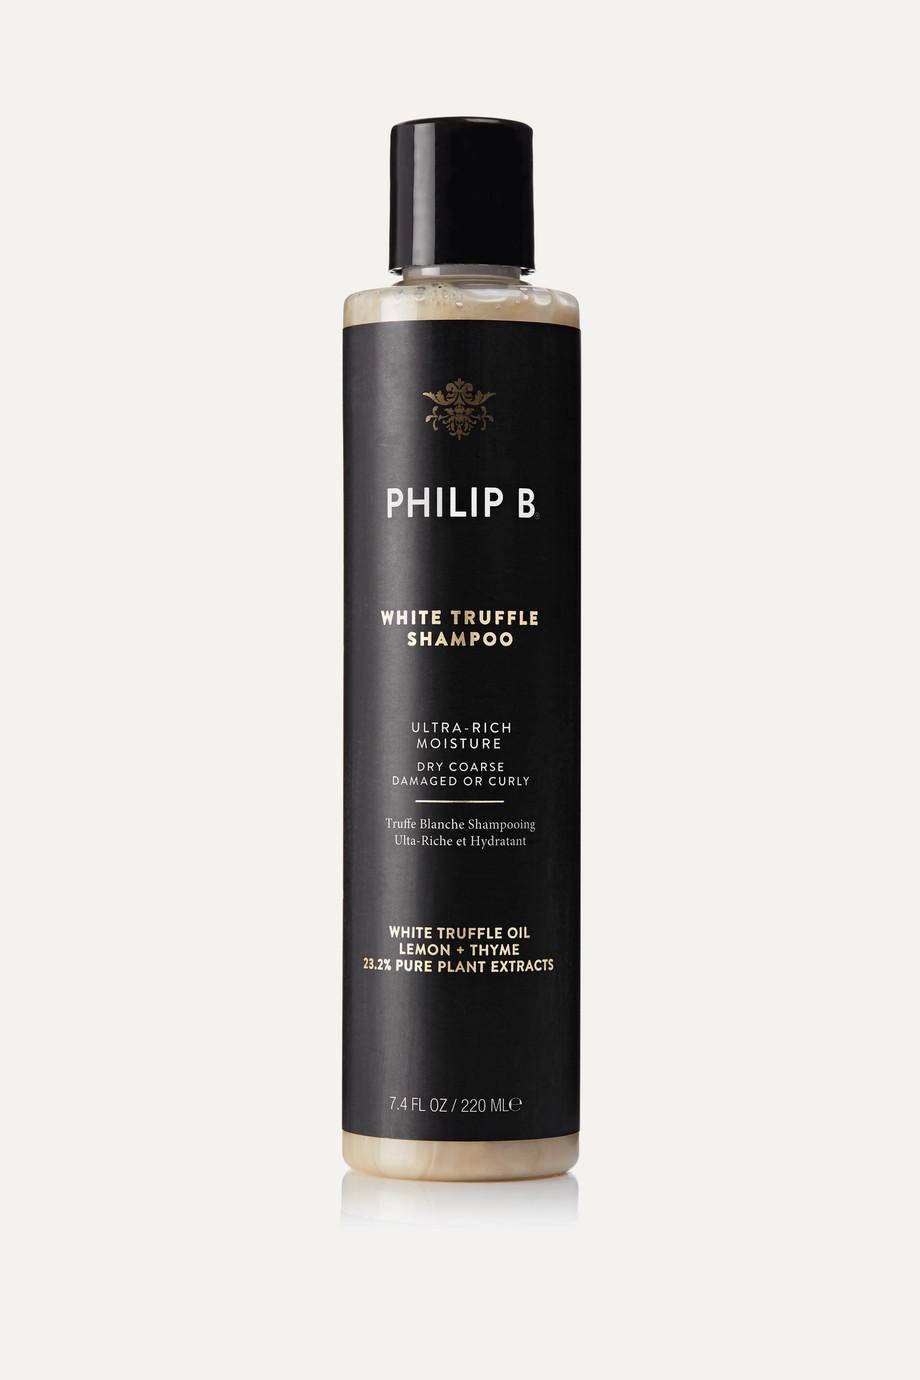 Philip B White Truffle Shampoo, 220ml